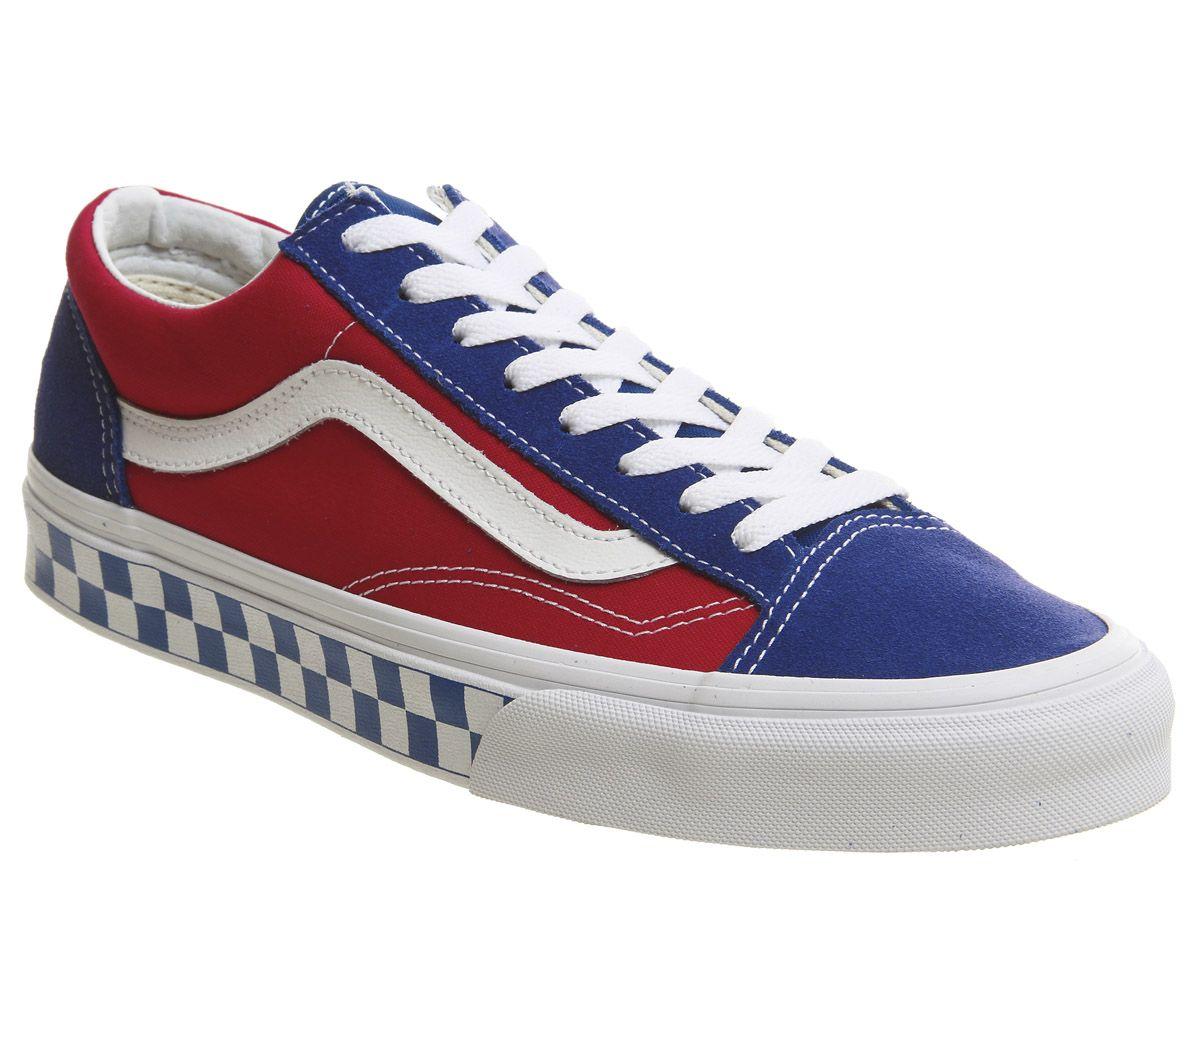 9f53f900f0 Vans Style 36 Bmx Checkerboard Blue Red - Sneaker herren